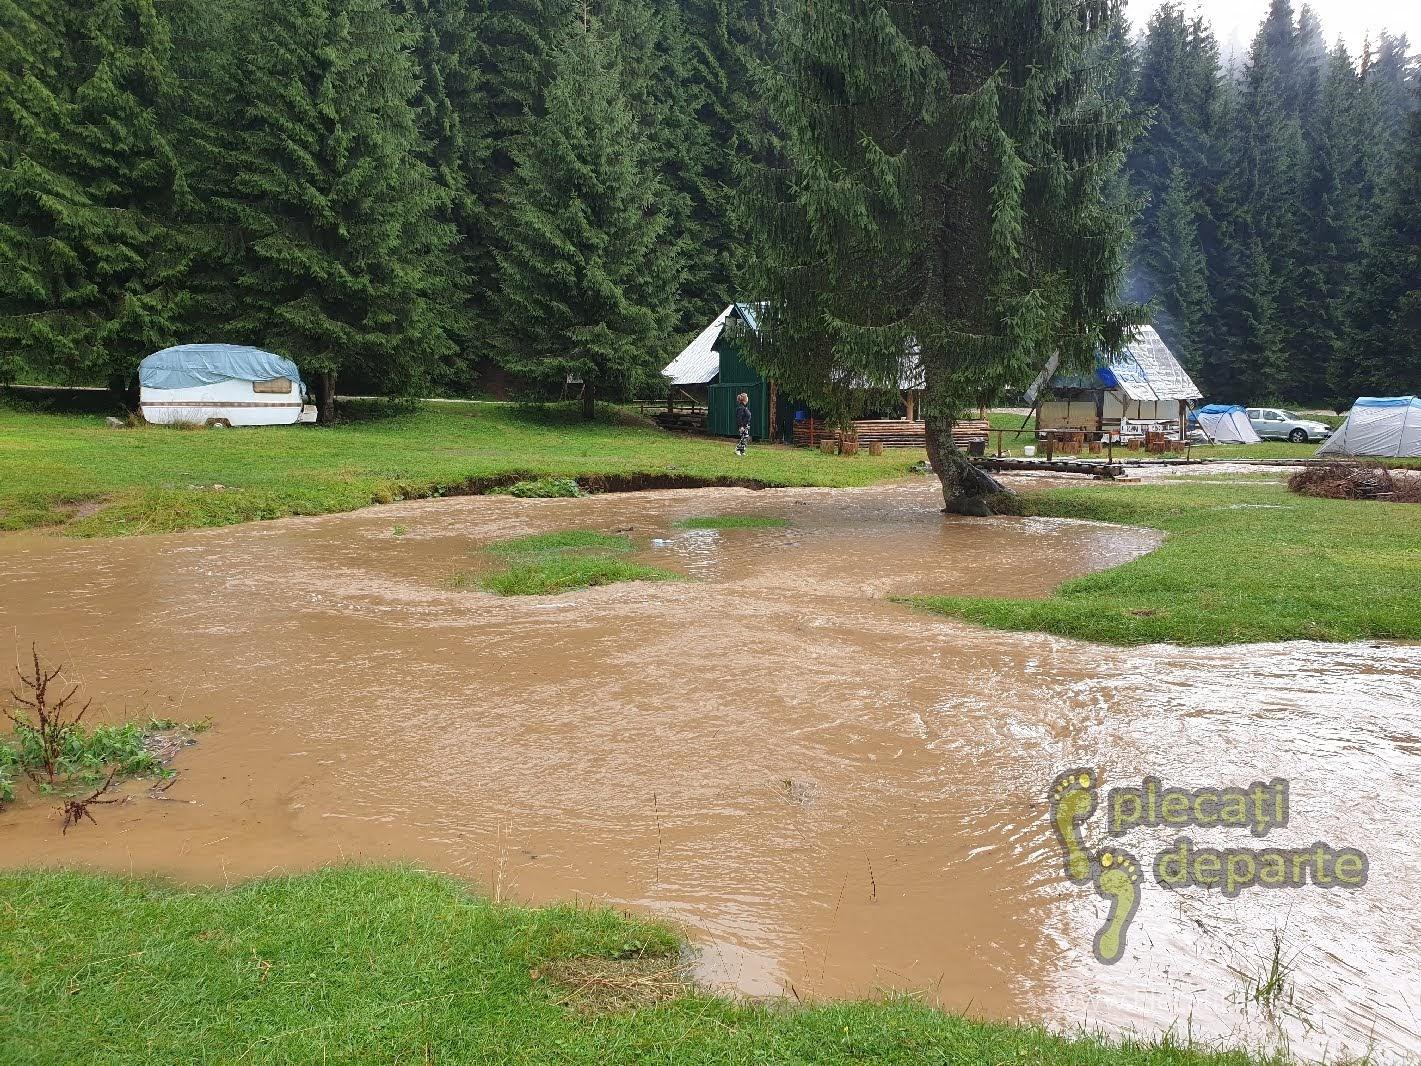 Dupa furtuna in Padis, in zona de campare Glavoi, ploi in padis, vremea padis, clima padis, trasee padis apuseni, parcul natural apuseni obiective turitice,